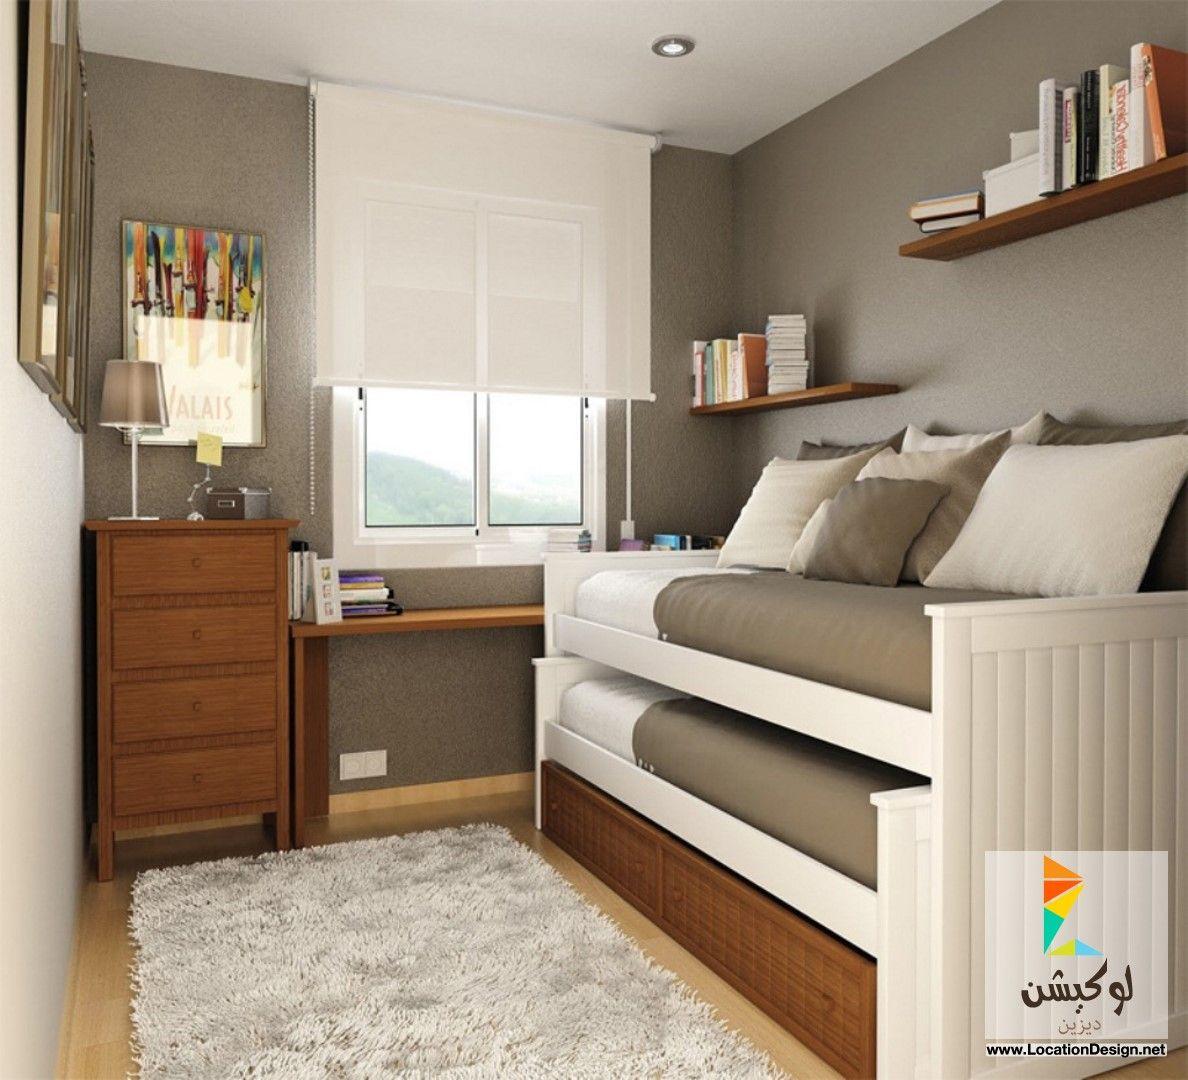 Bedroom Interior Design Ideas Small Spaces Mesmerizing غرف اطفال مراهقين بتصميمات مودرن  غرف نوم اطفال  Pinterest Inspiration